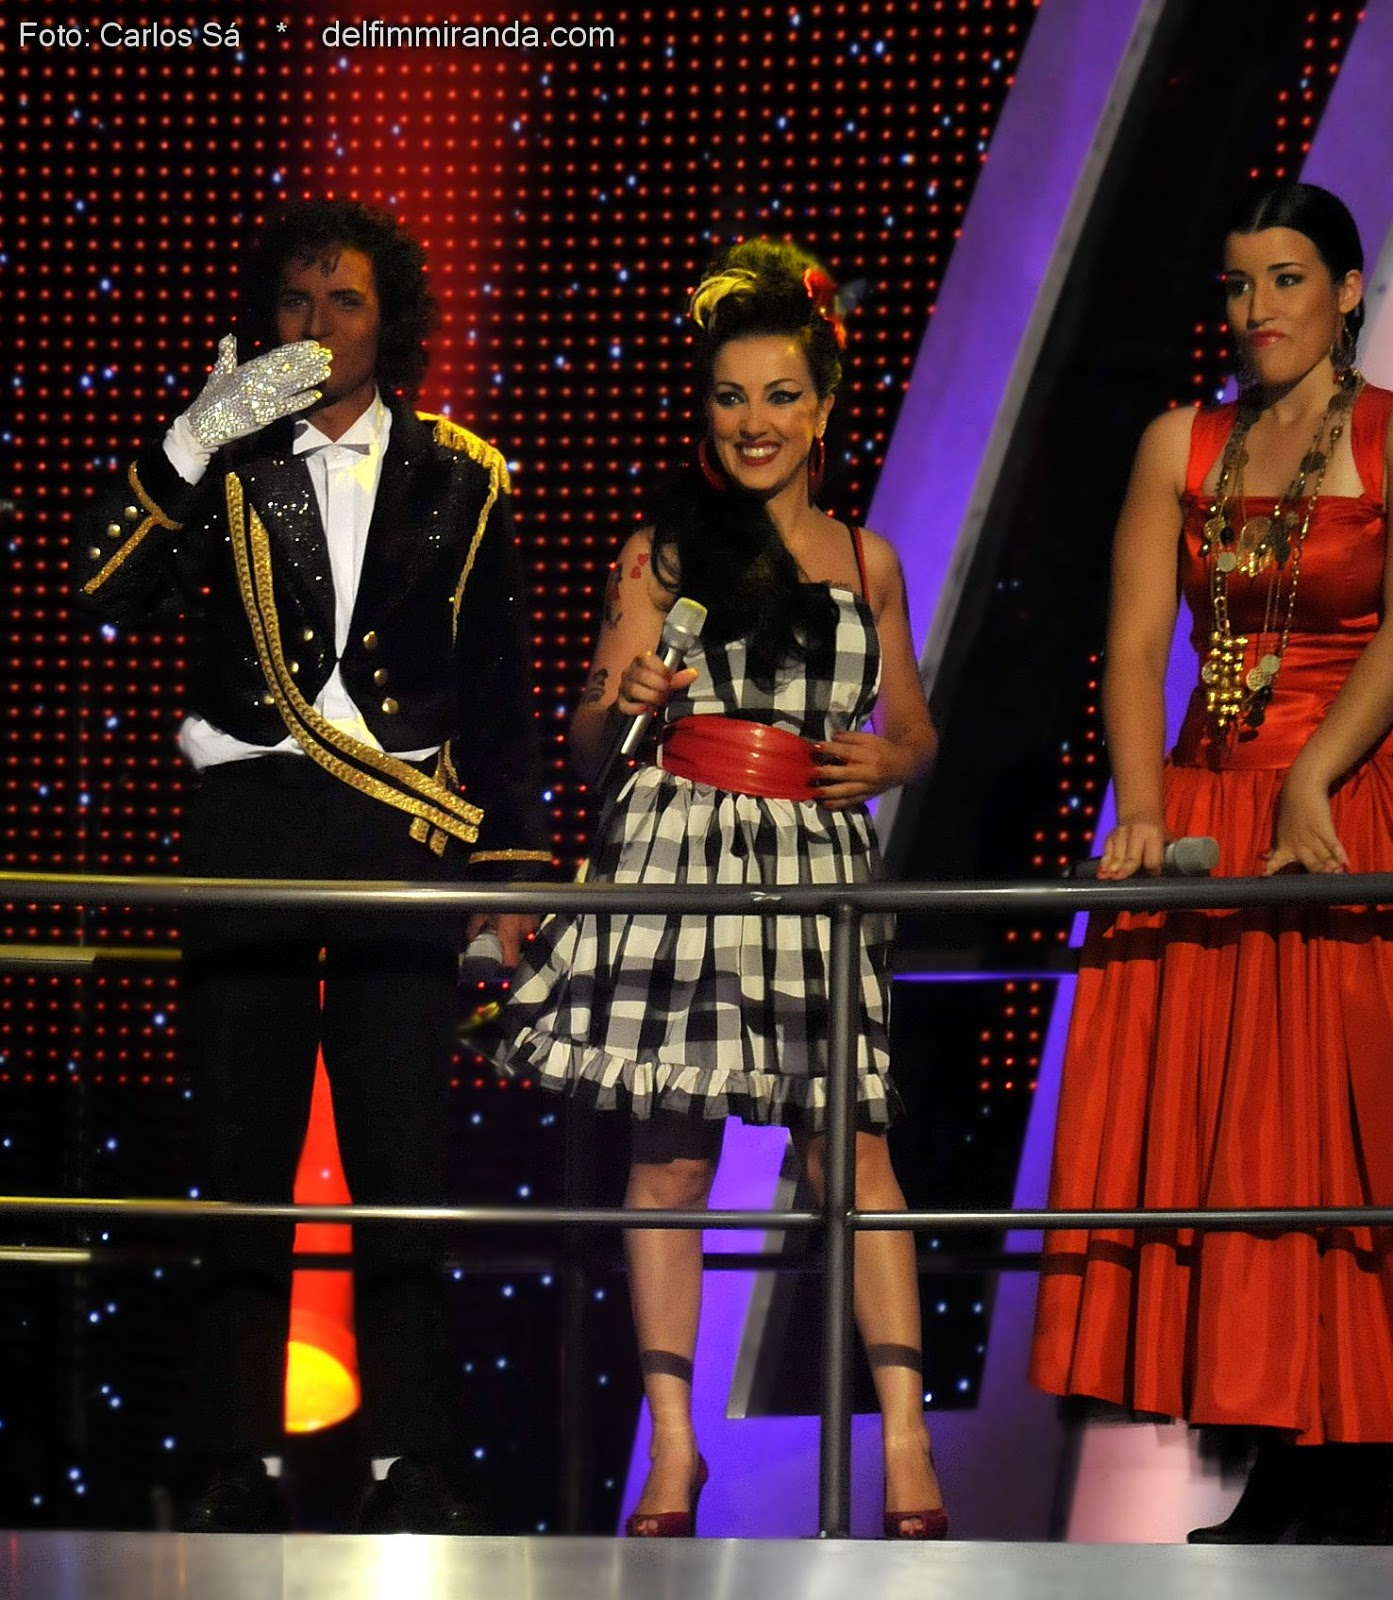 Delfim Miranda - Michael Jackson Tribute - Legens on TV - Michael Jackson - Amy Whinehouse - Nelly Furtado